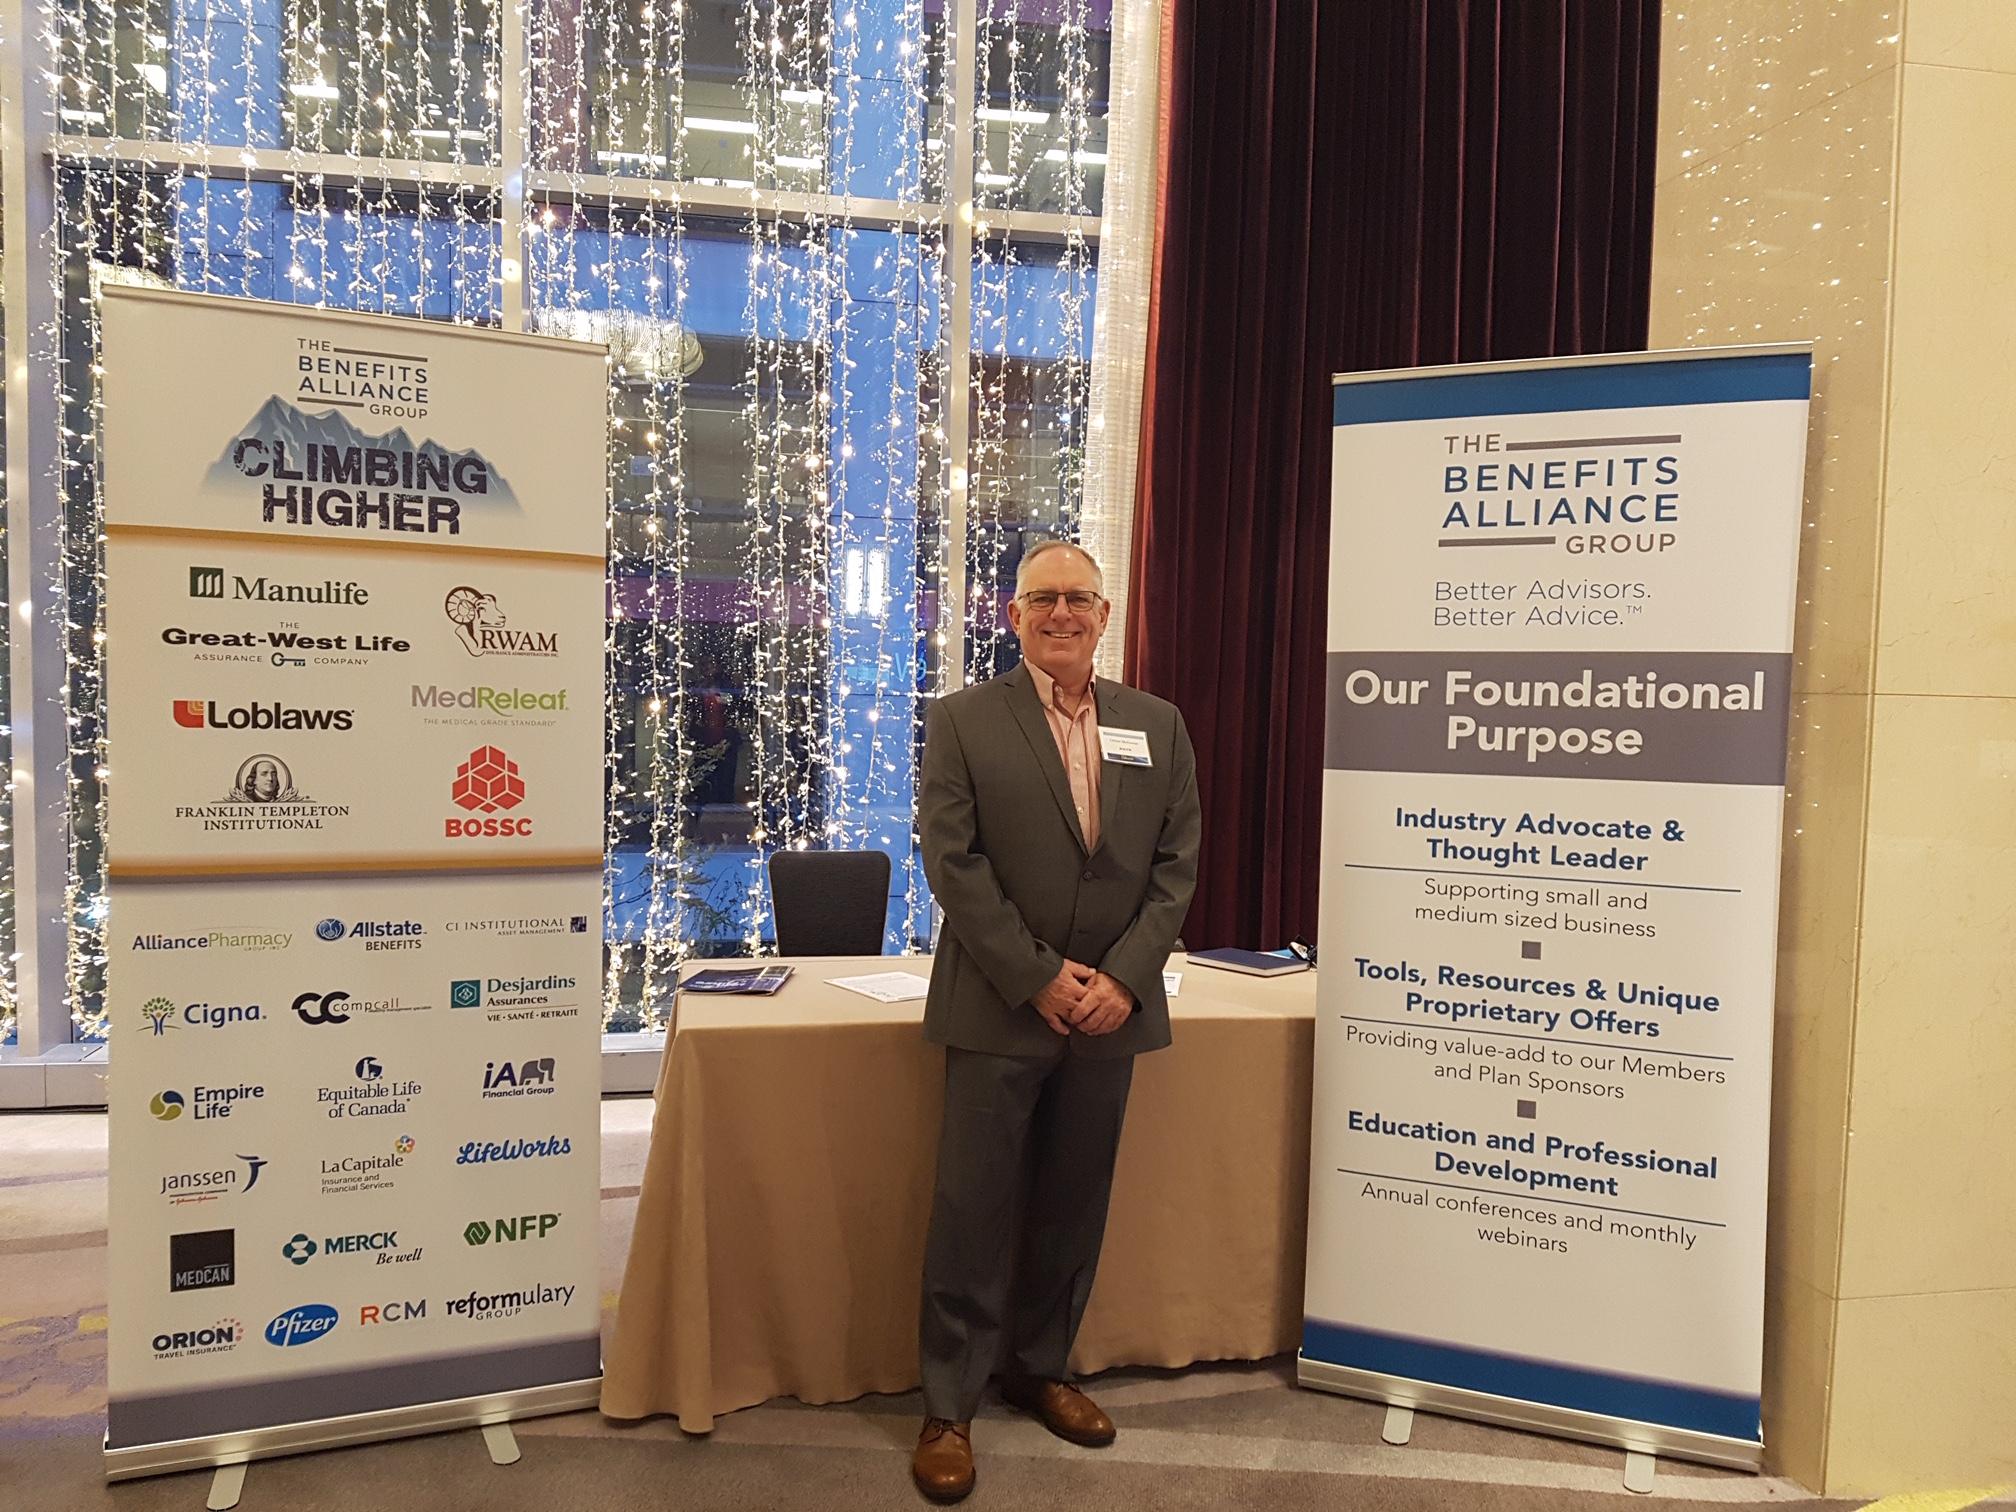 Advocis Symposium: The Benefits Alliance Group